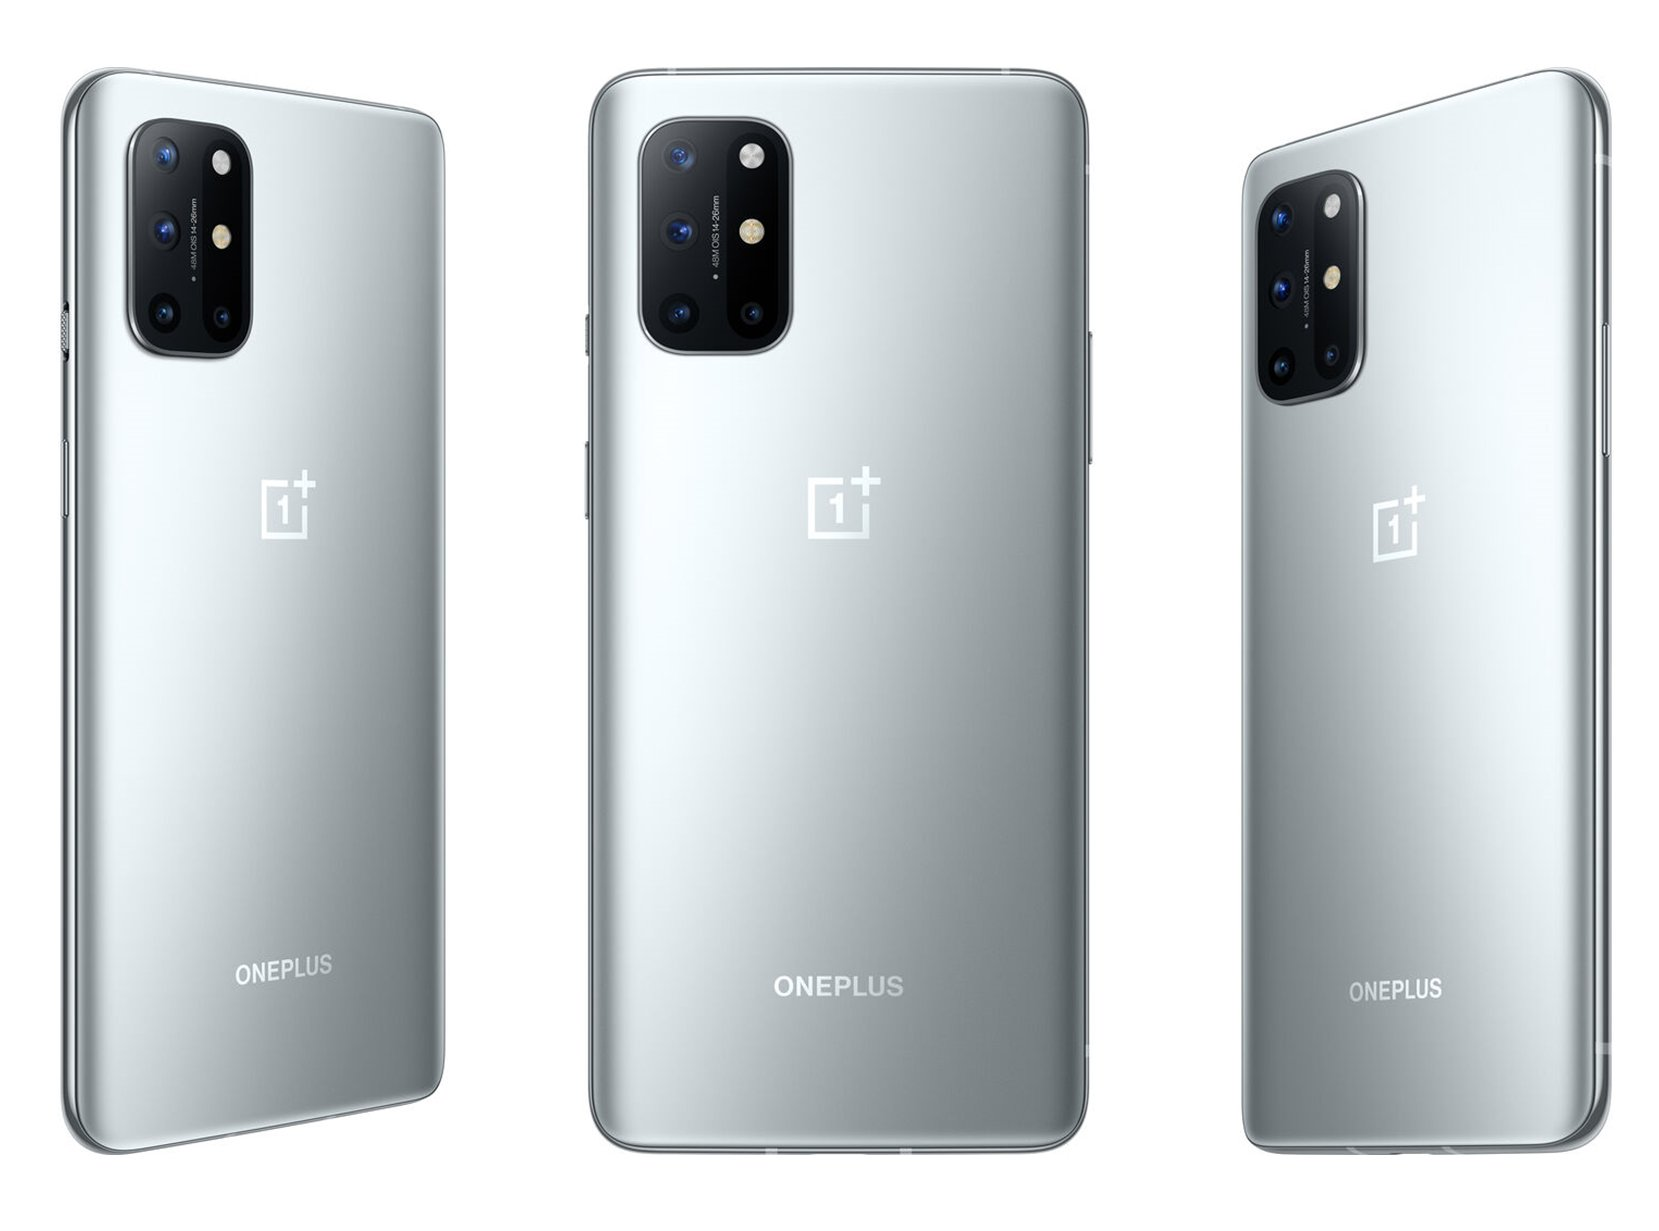 Рендеры и характеристики OnePlus 8T в двух цветах Другие устройства  - vse_harakteristiki_i_mnogo_renderov_oneplus_8t_pered_anonsom_4